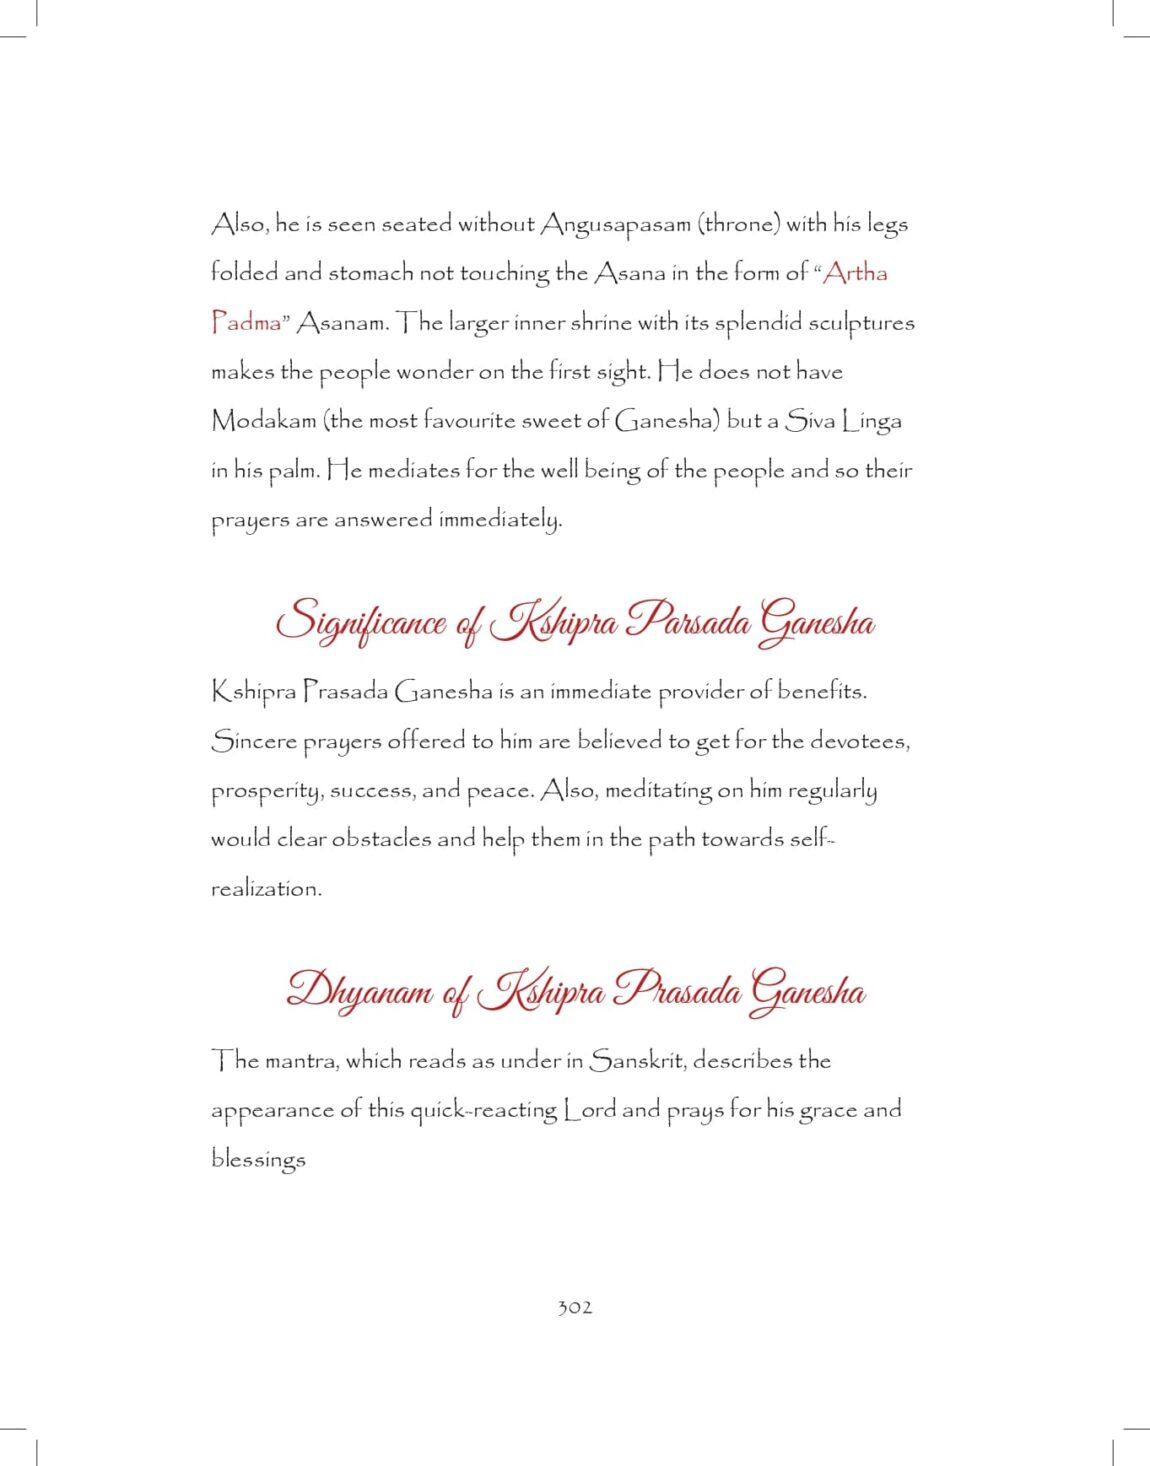 Ganesh-print_pages-to-jpg-0302.jpg